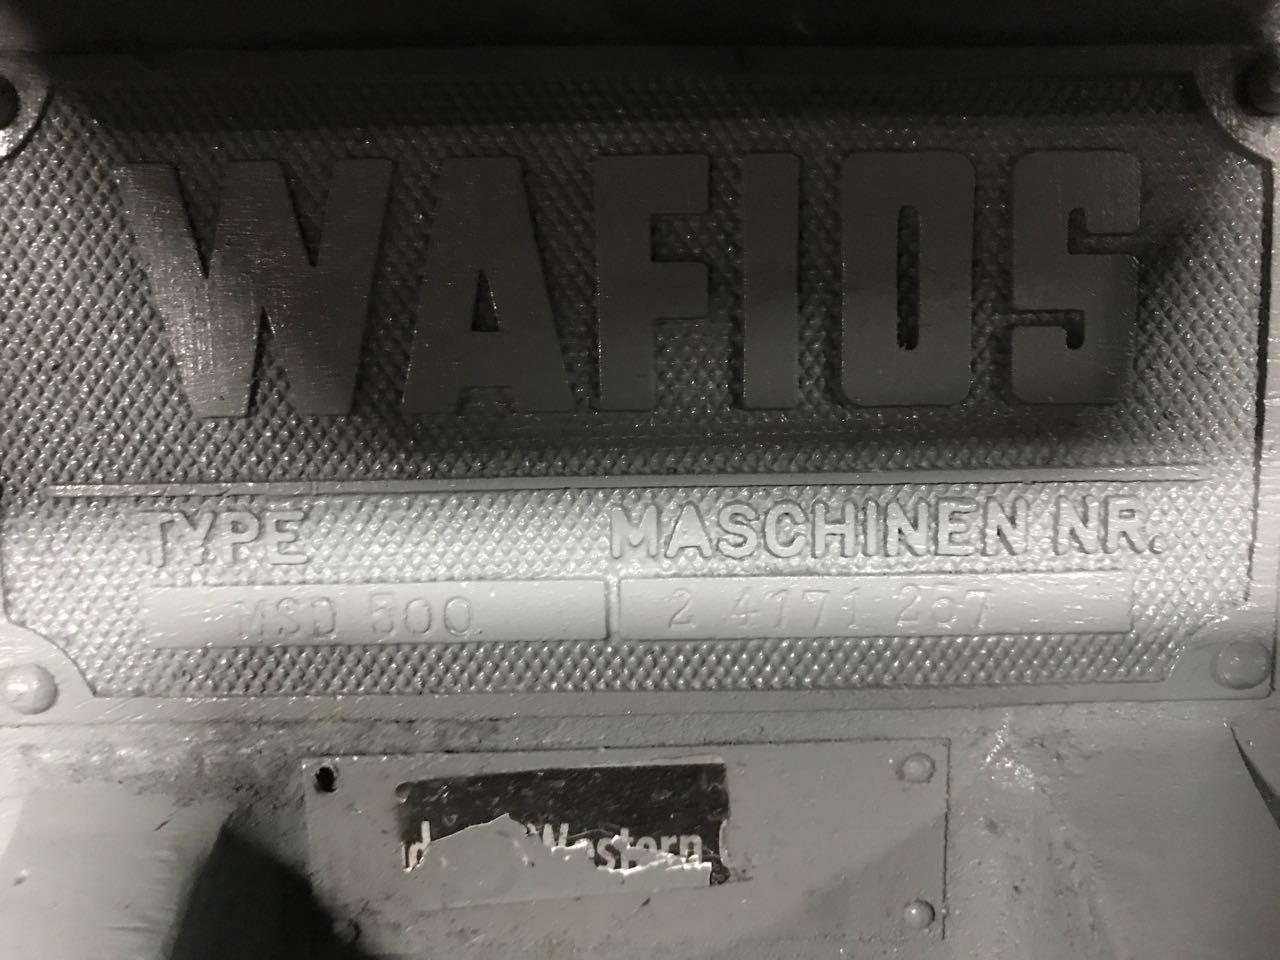 Wafios Model MSD500 Cutter Grinder